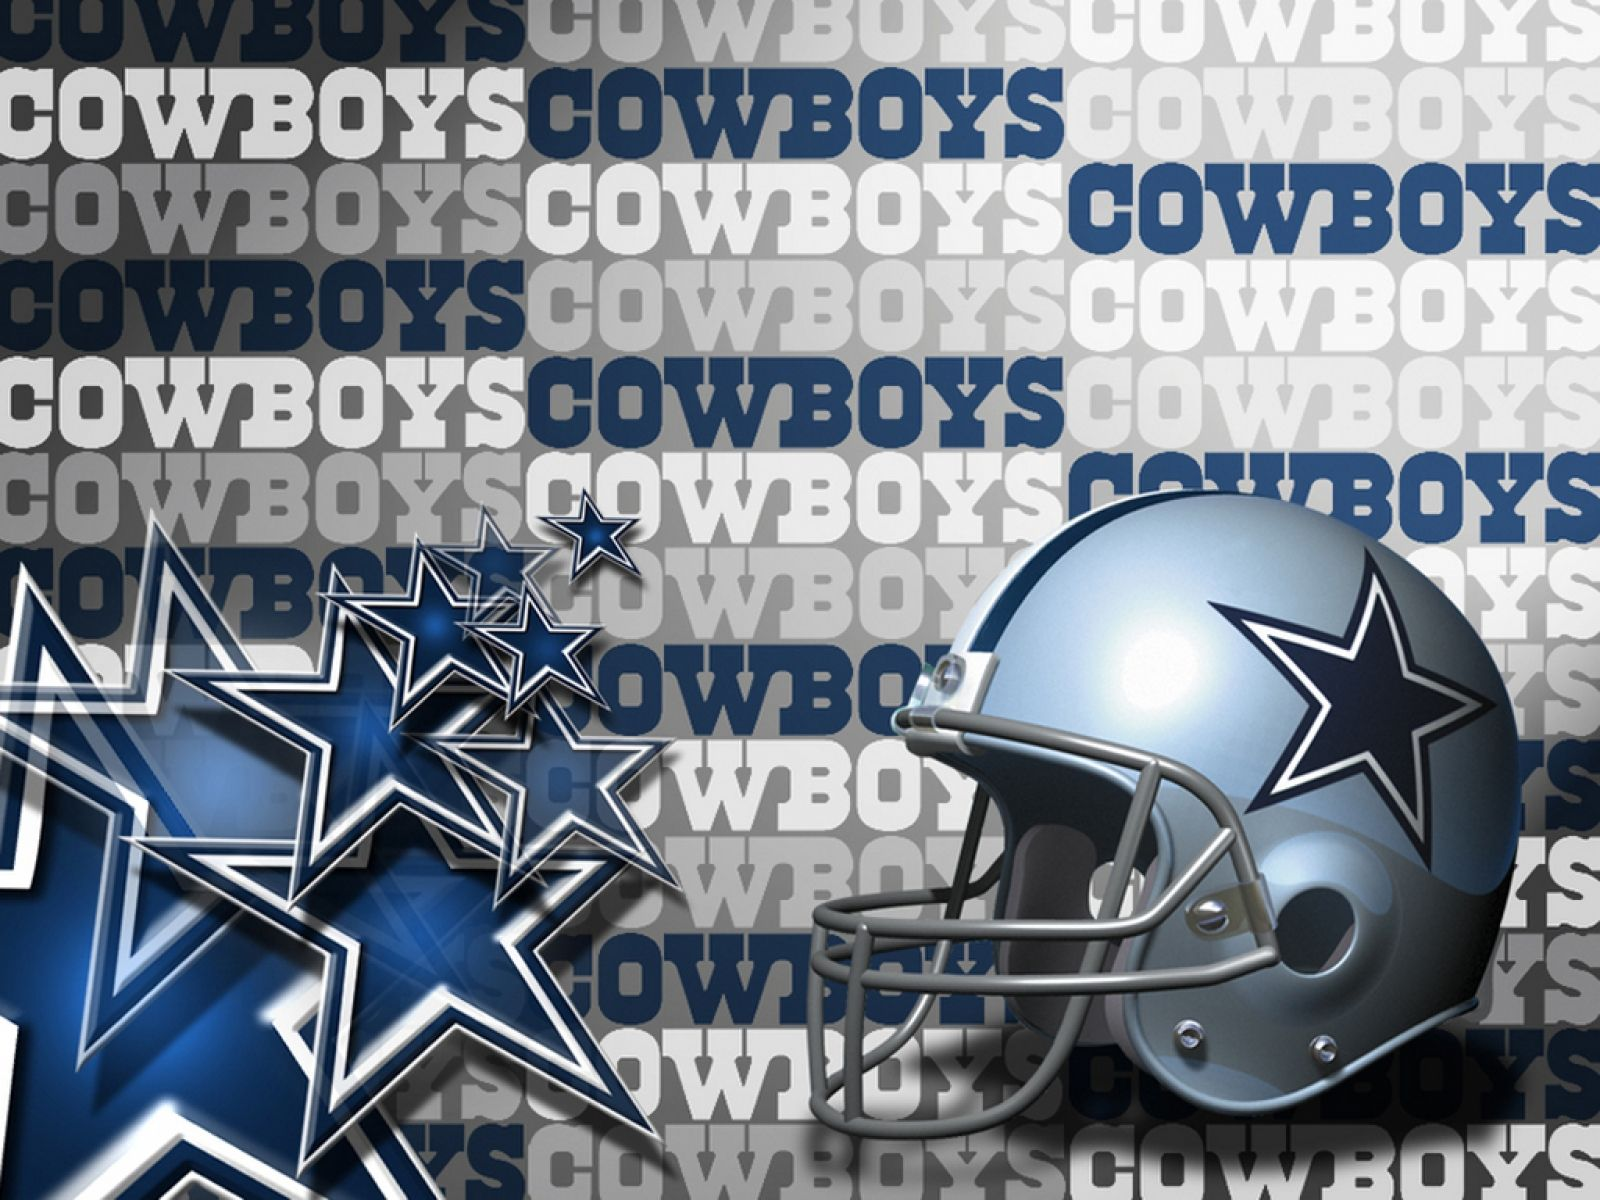 Cool Dallas Cowboys wallpaper for computers Evolutionext 1600x1200